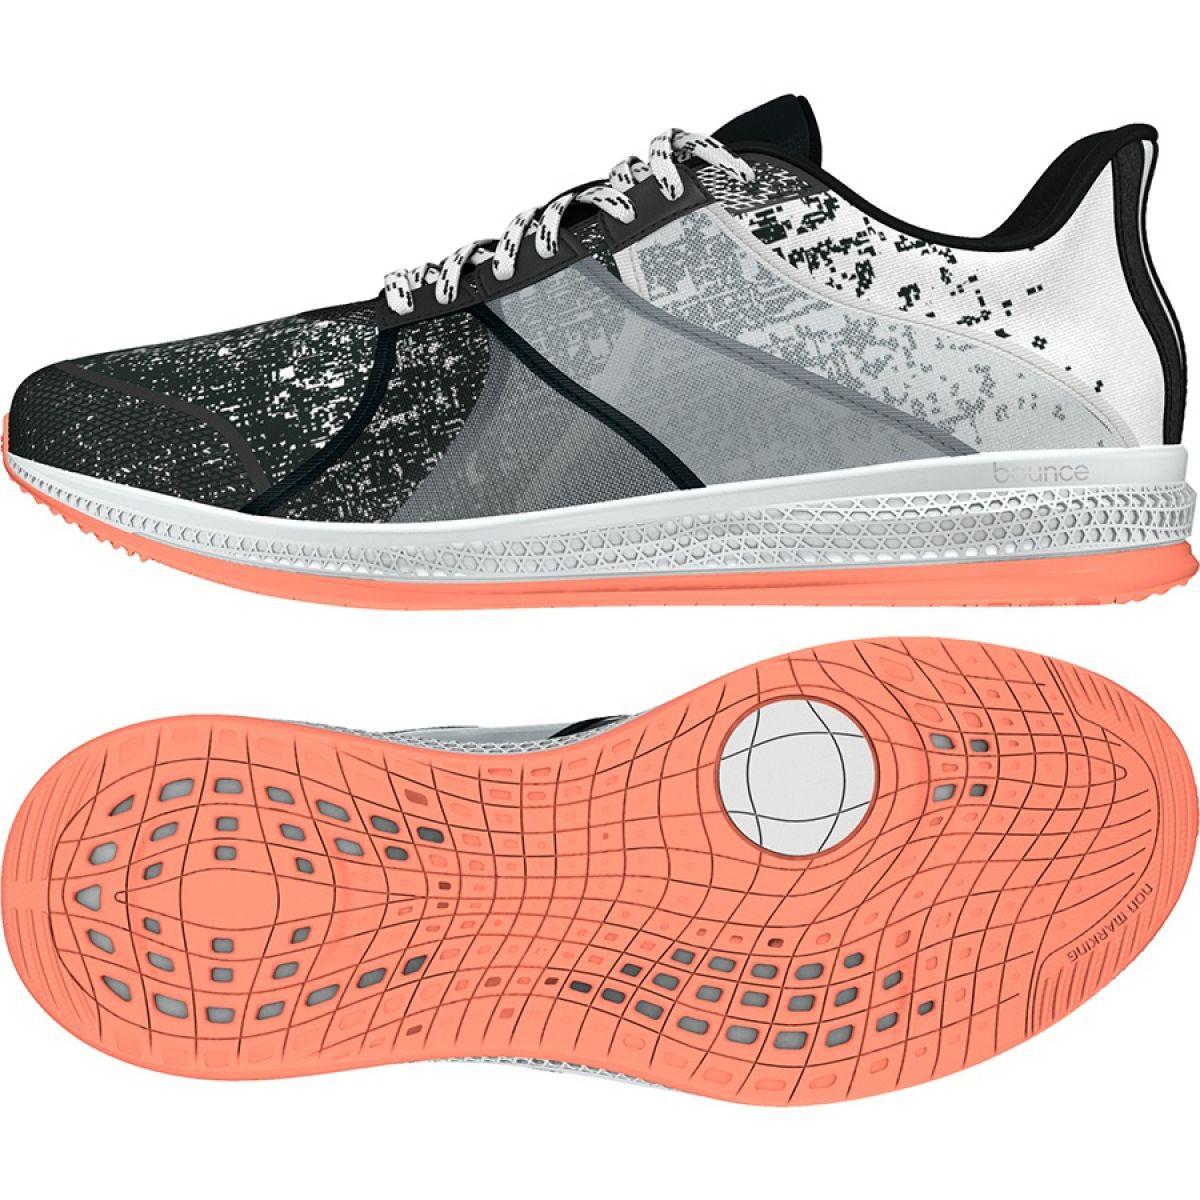 Agente de mudanzas Altitud Mentalmente  Adidas Gymbreaker Bounce W BB3985 white black grey - ButyModne.pl